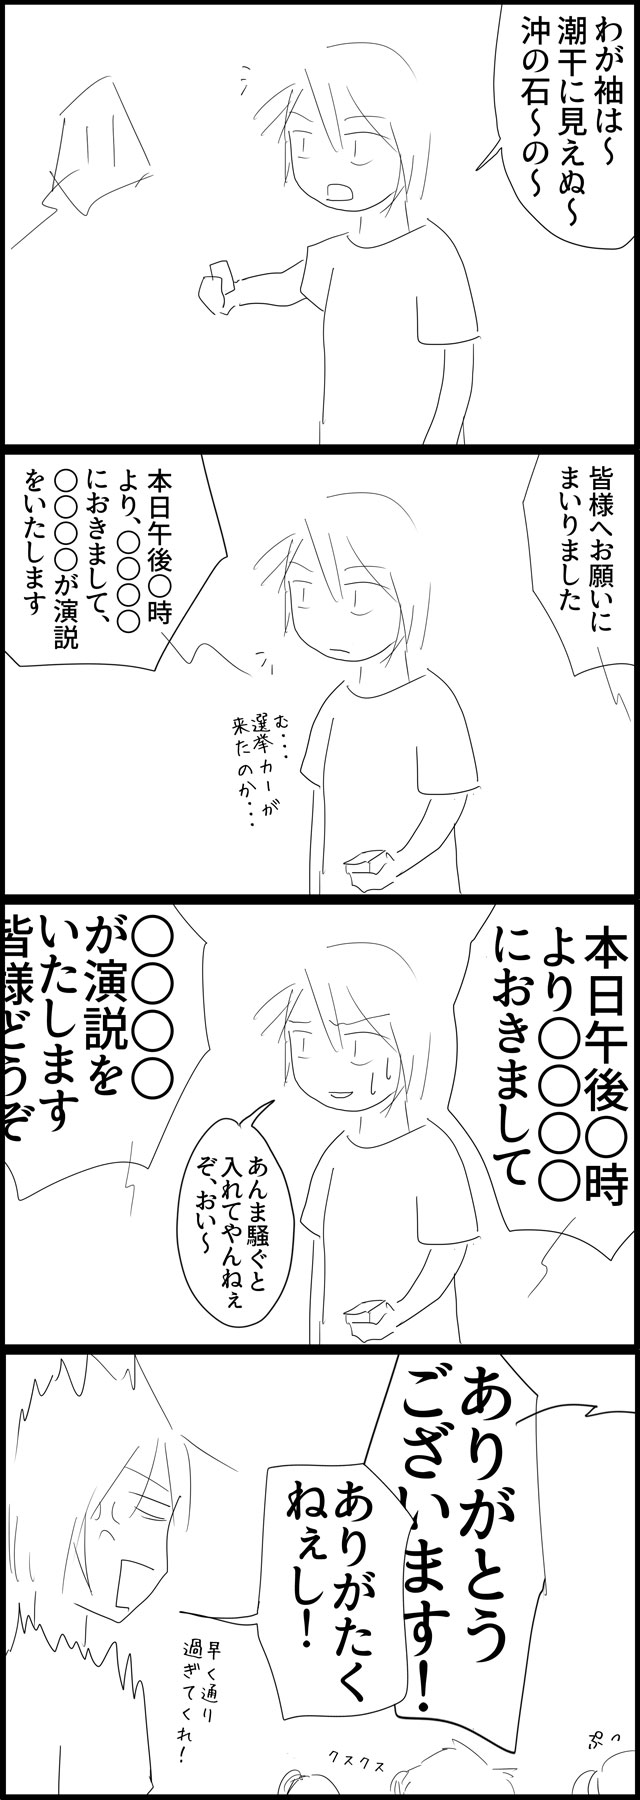 f:id:karutaru:20160704173241j:image:w480